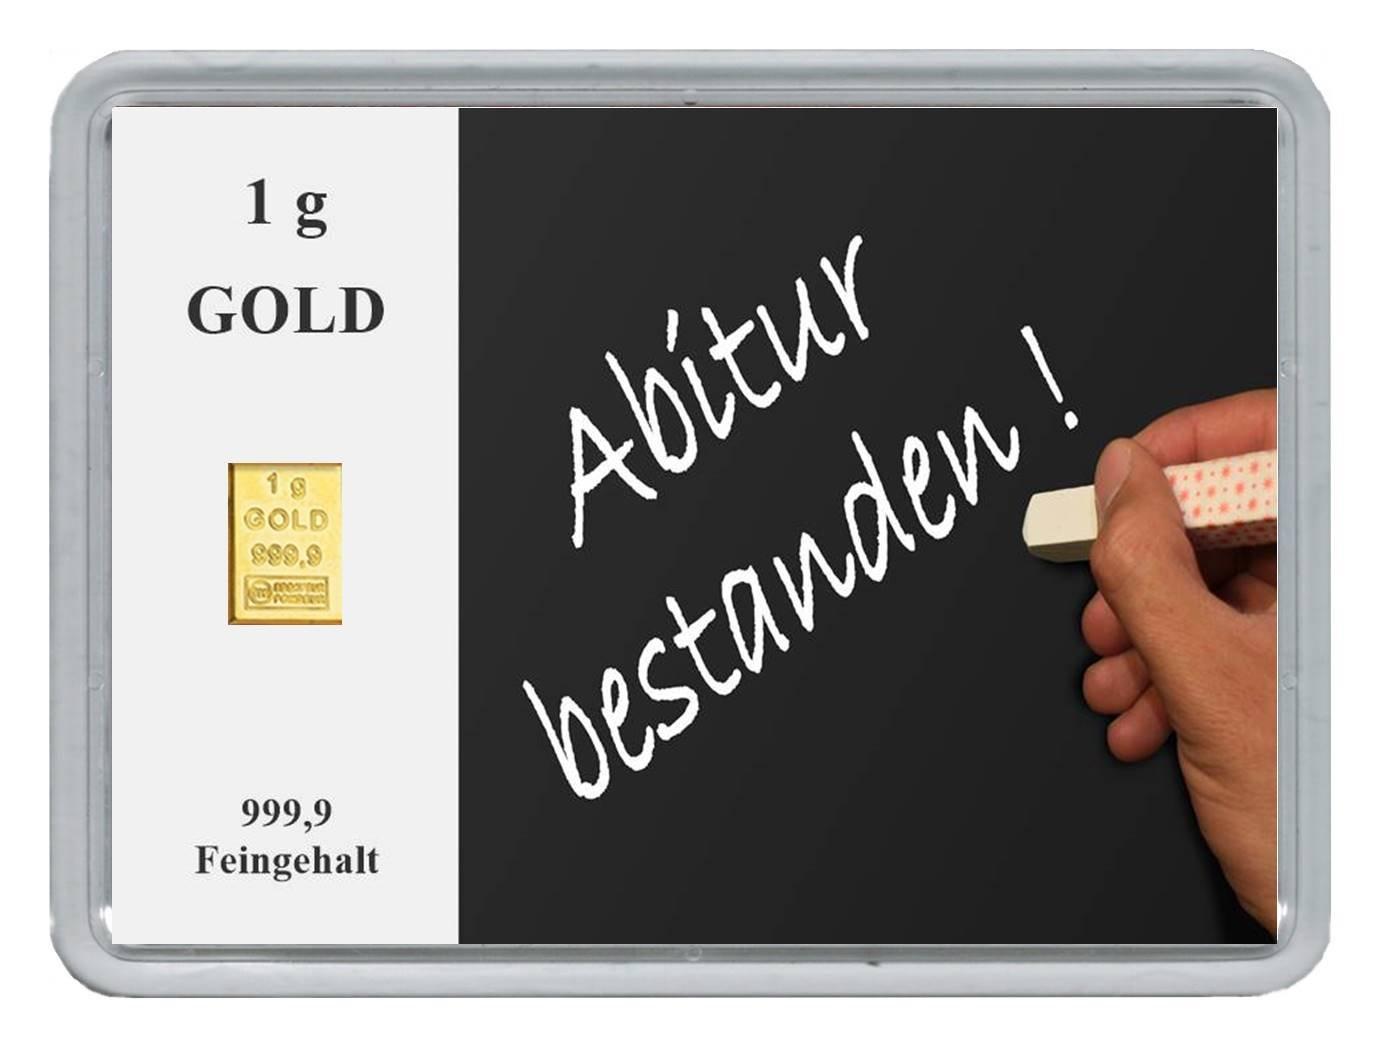 New Edition 1g Goldbarren 999,9 FeinGold in Motivbox Abitur .  in edler Goldverpackung B078JJ5DYW | Angenehmes Gefühl